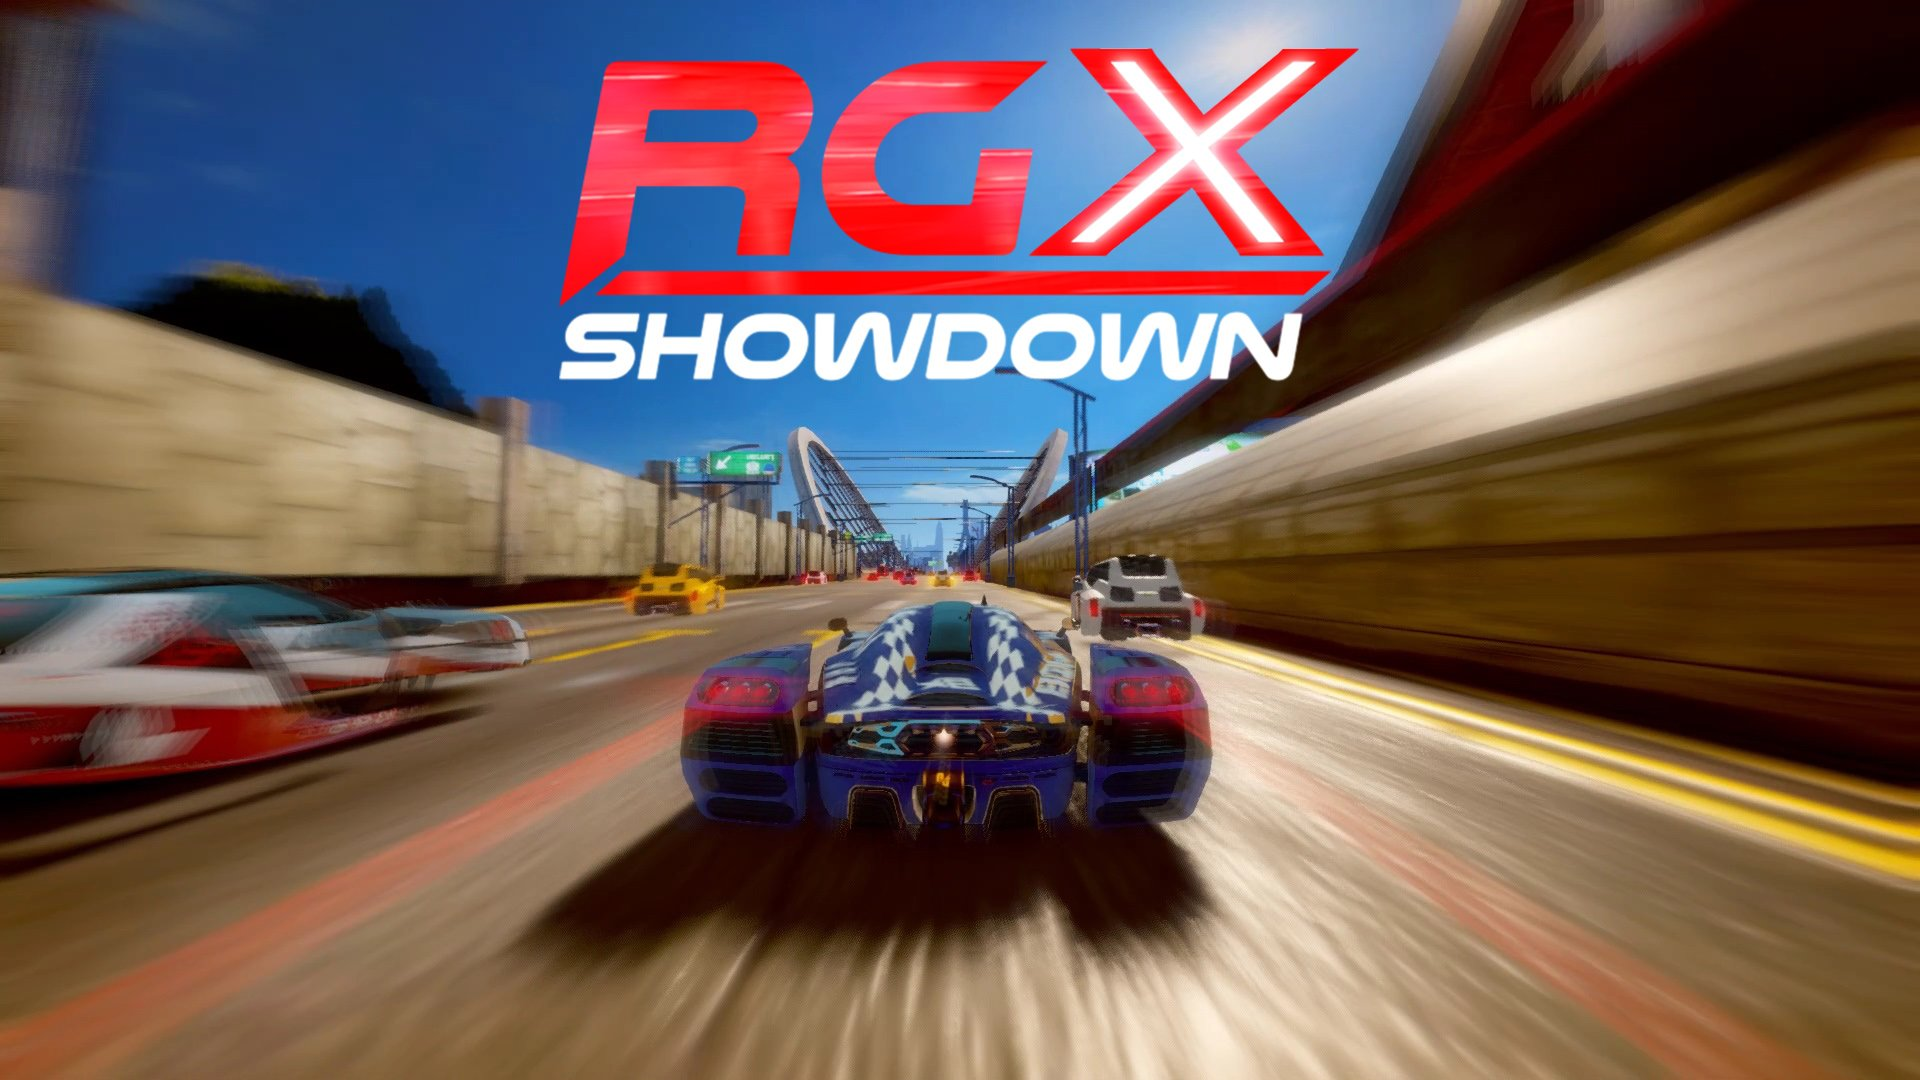 RGX Showdown (PS4) Review